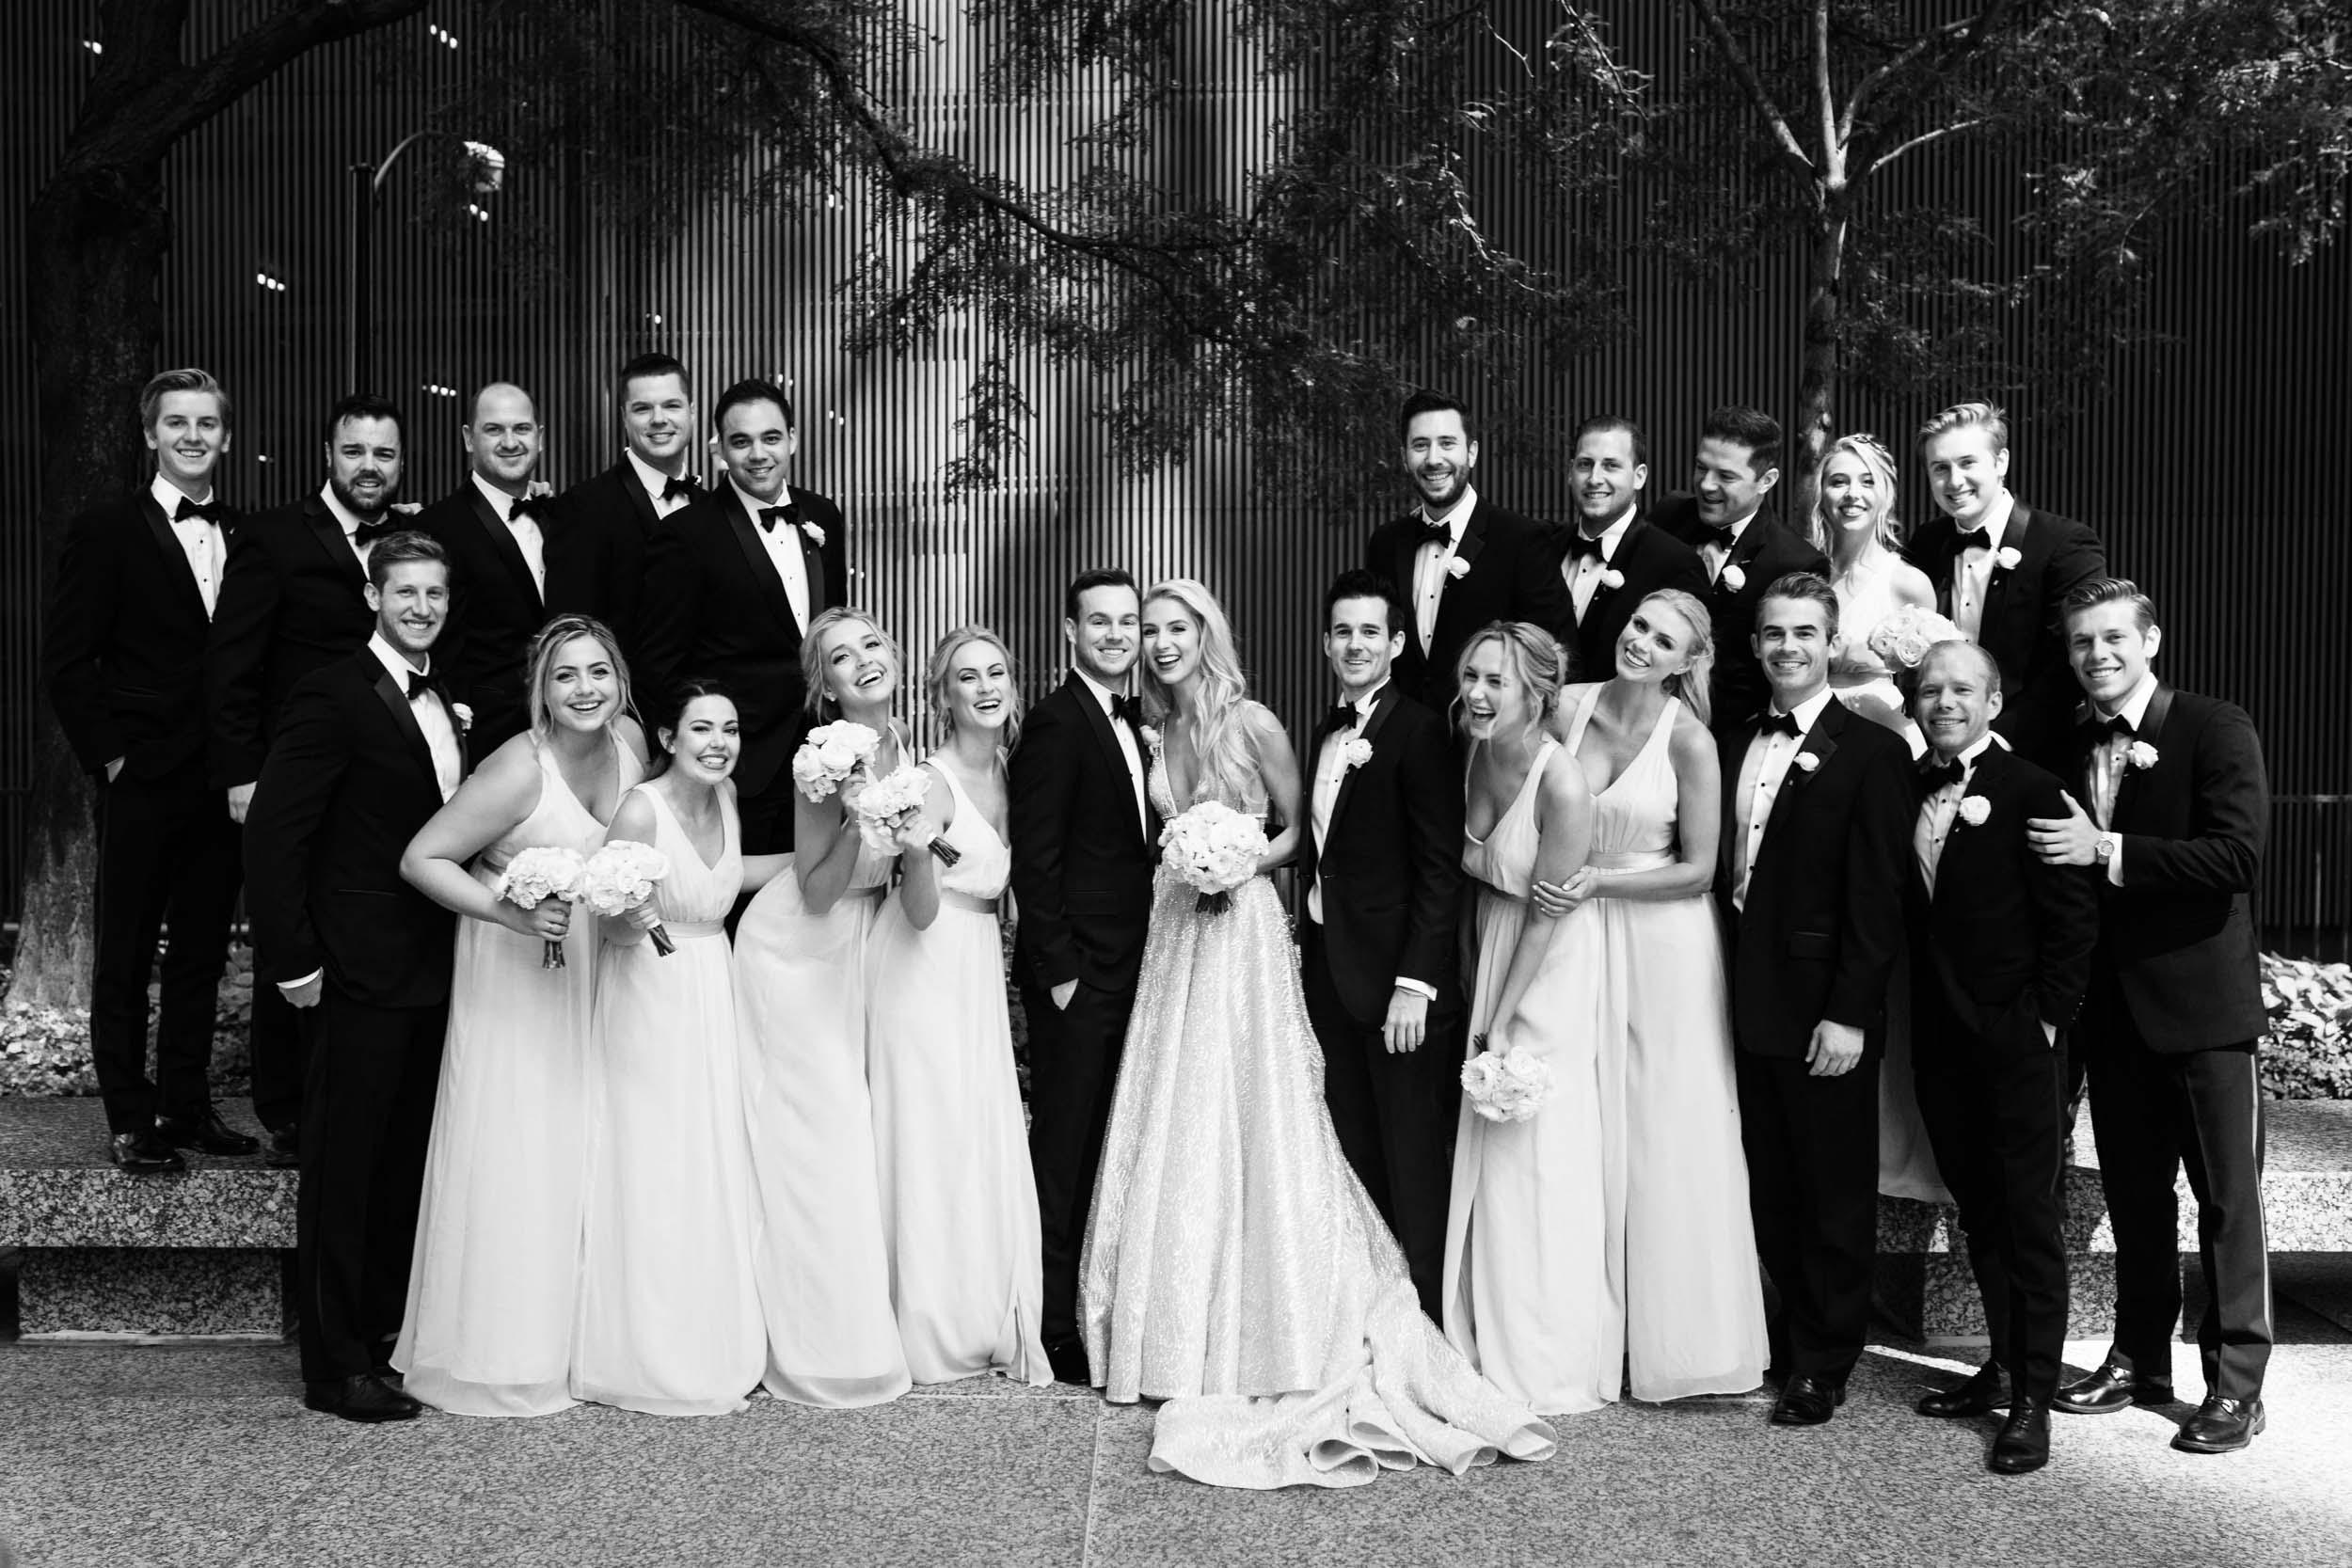 chicago-illuminating-co-wedding-photos-26.jpg